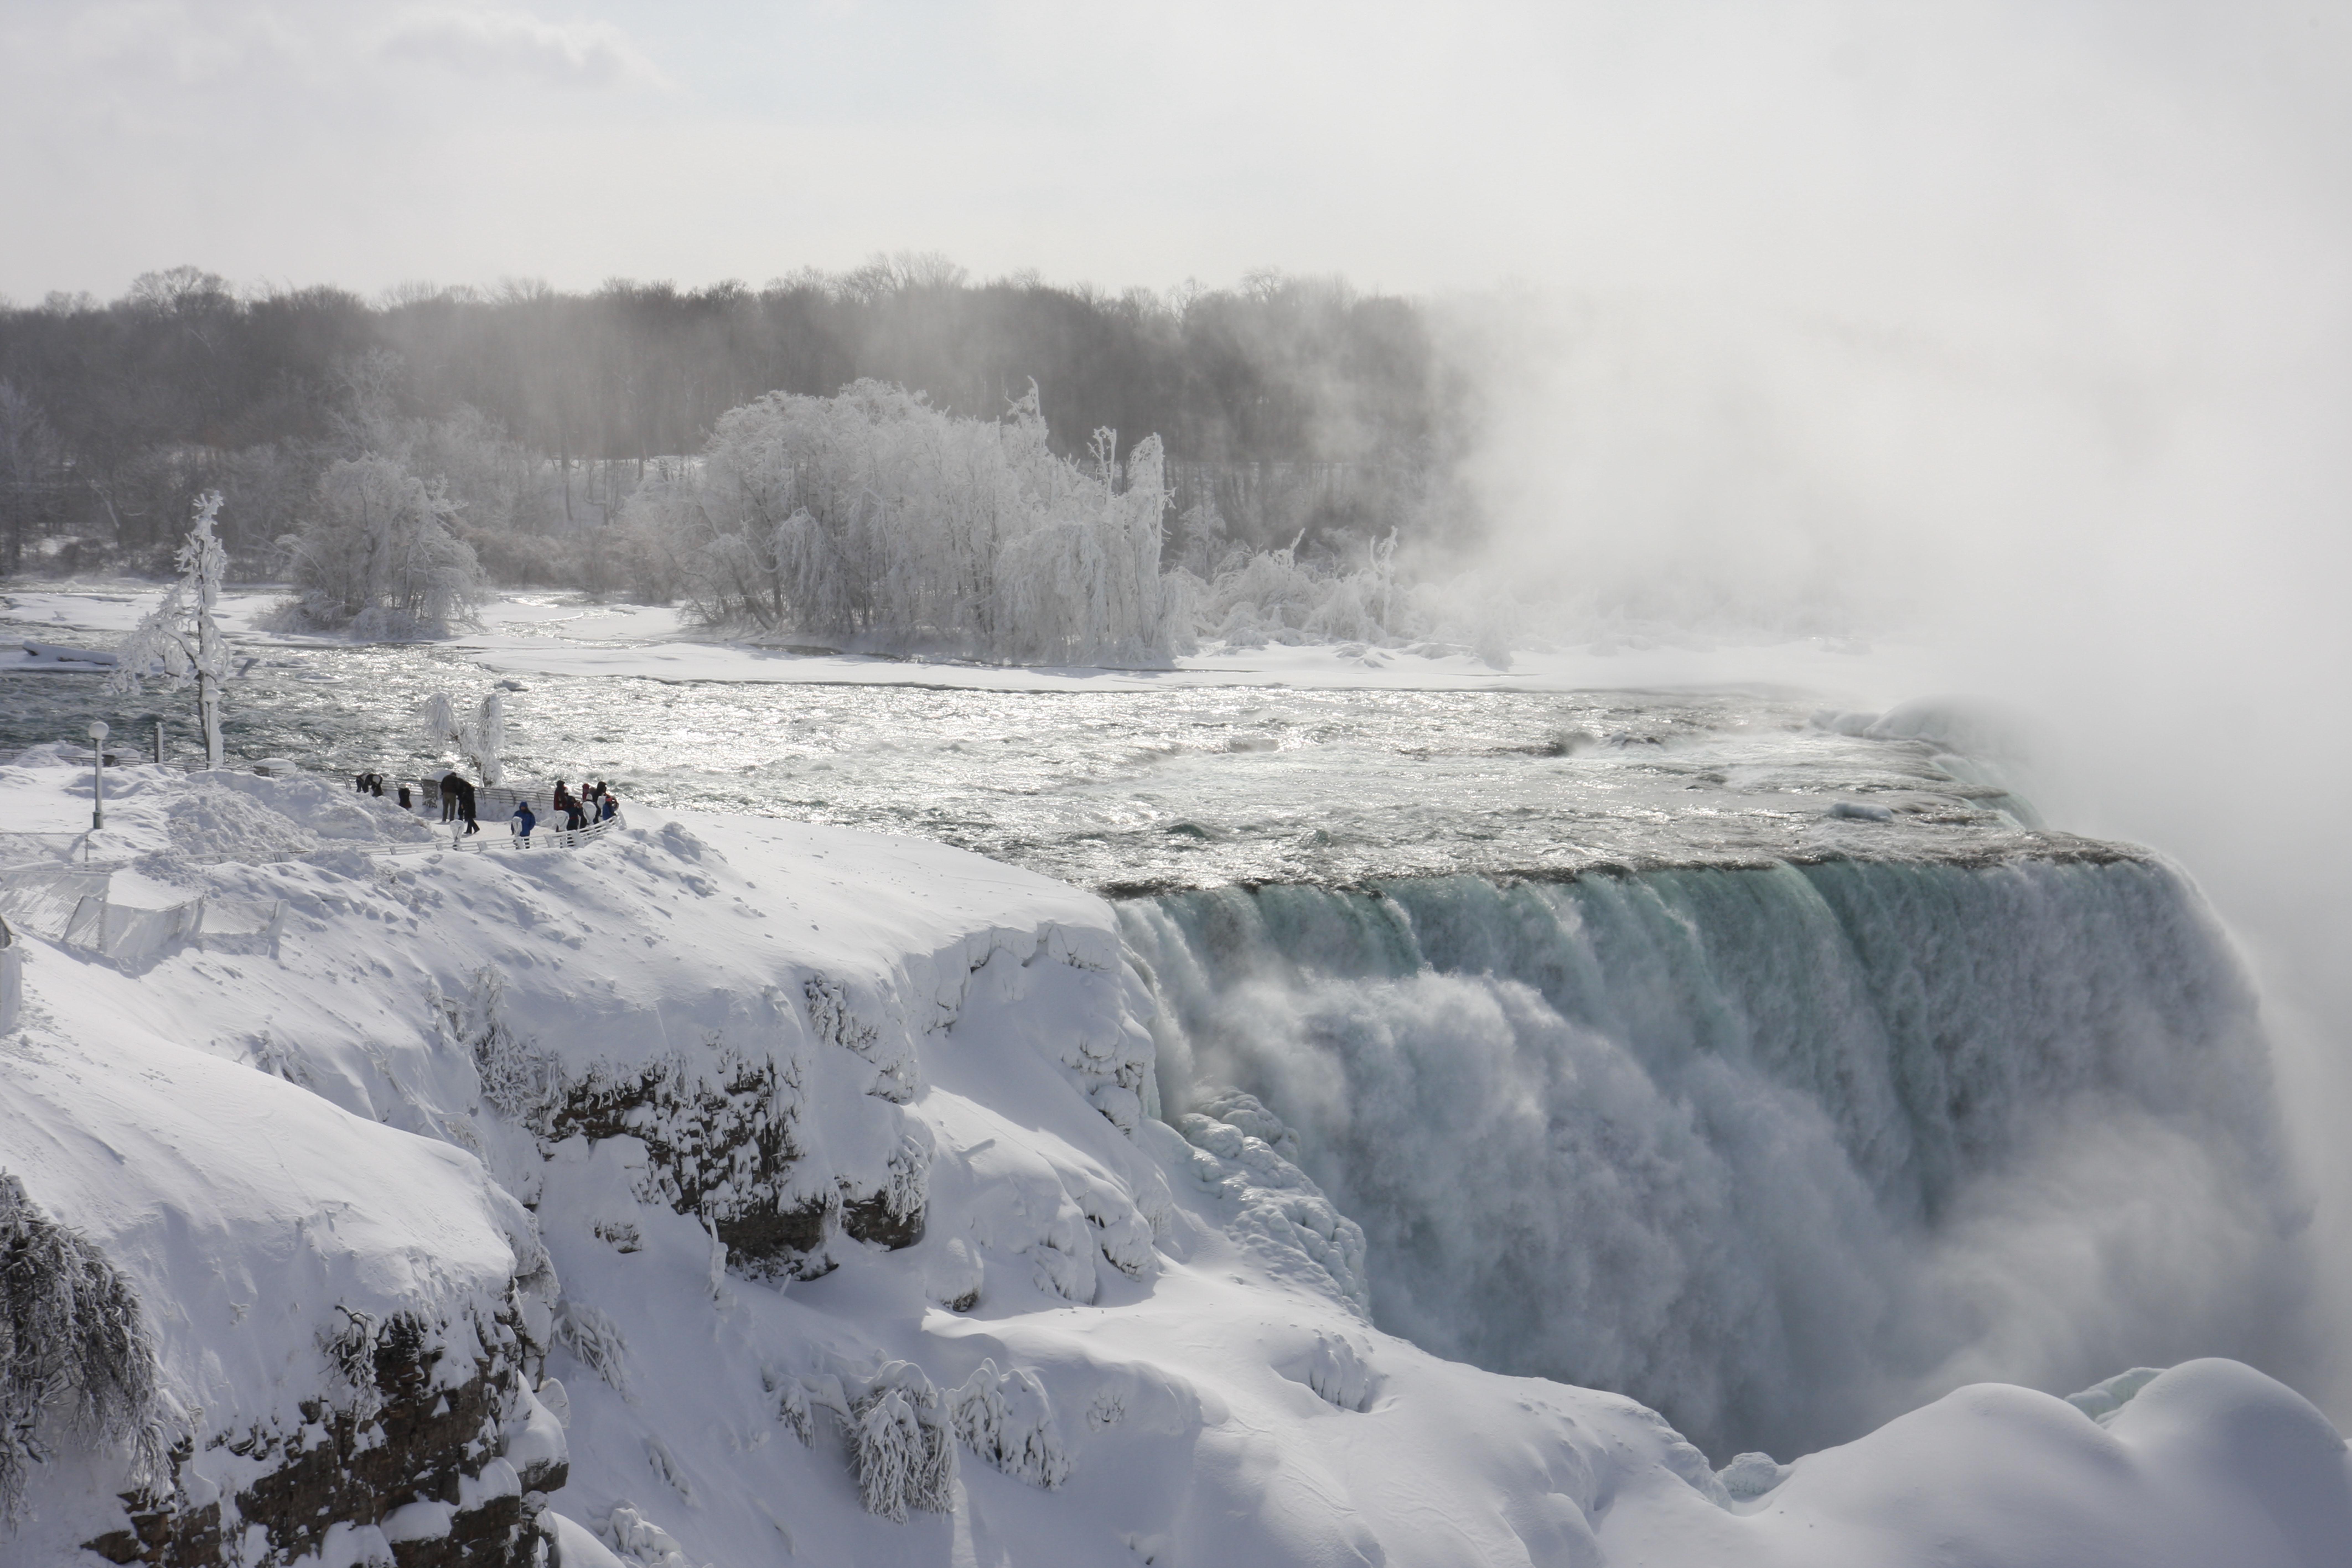 Greater Niagara Fishing Amp Outdoor Expo Niagara Falls Ny